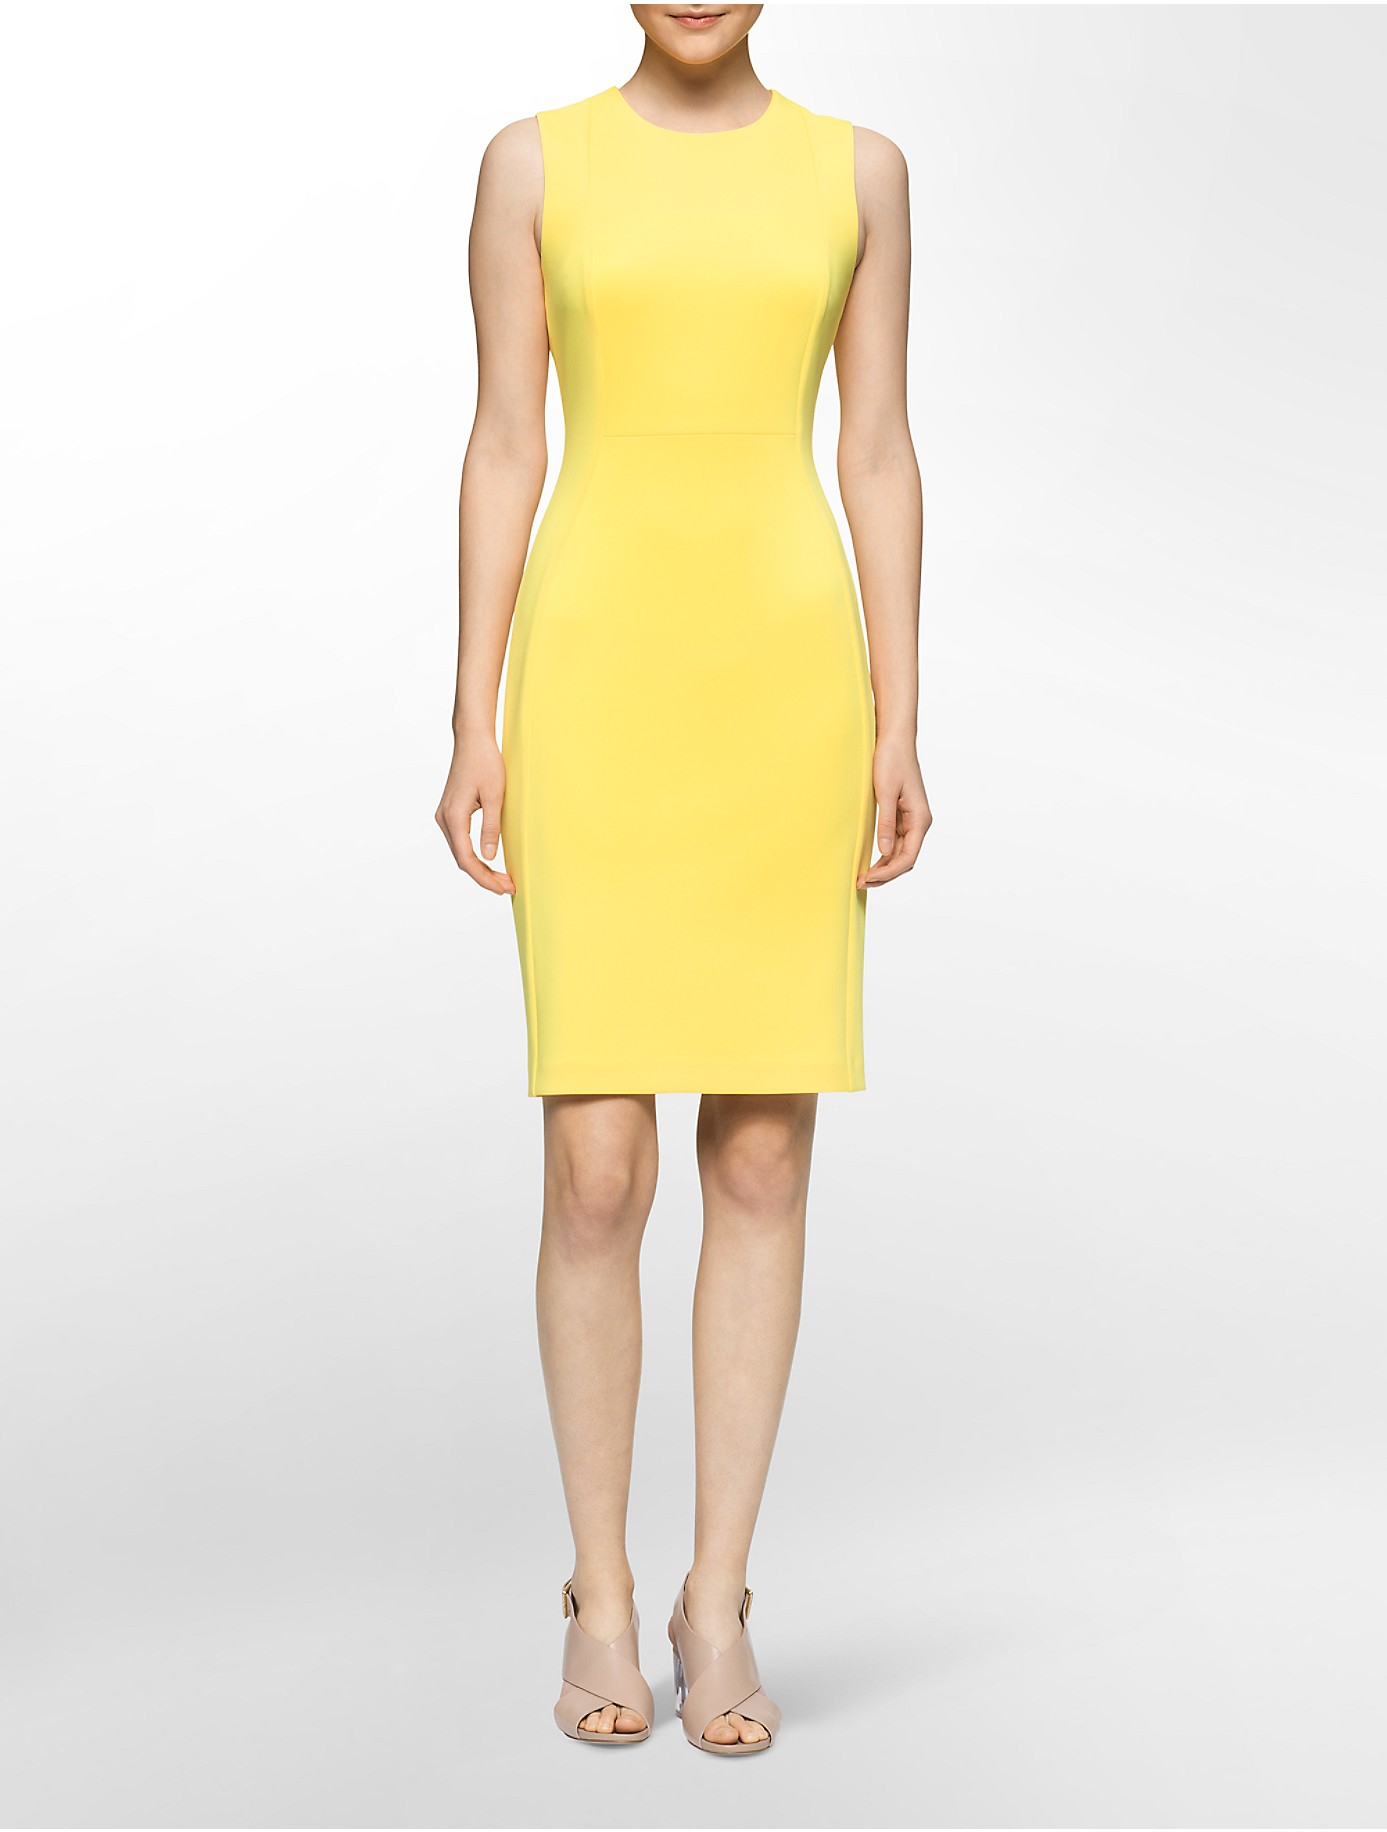 Lyst - Calvin Klein White Label Solid Scuba Sleeveless Sheath Dress ...